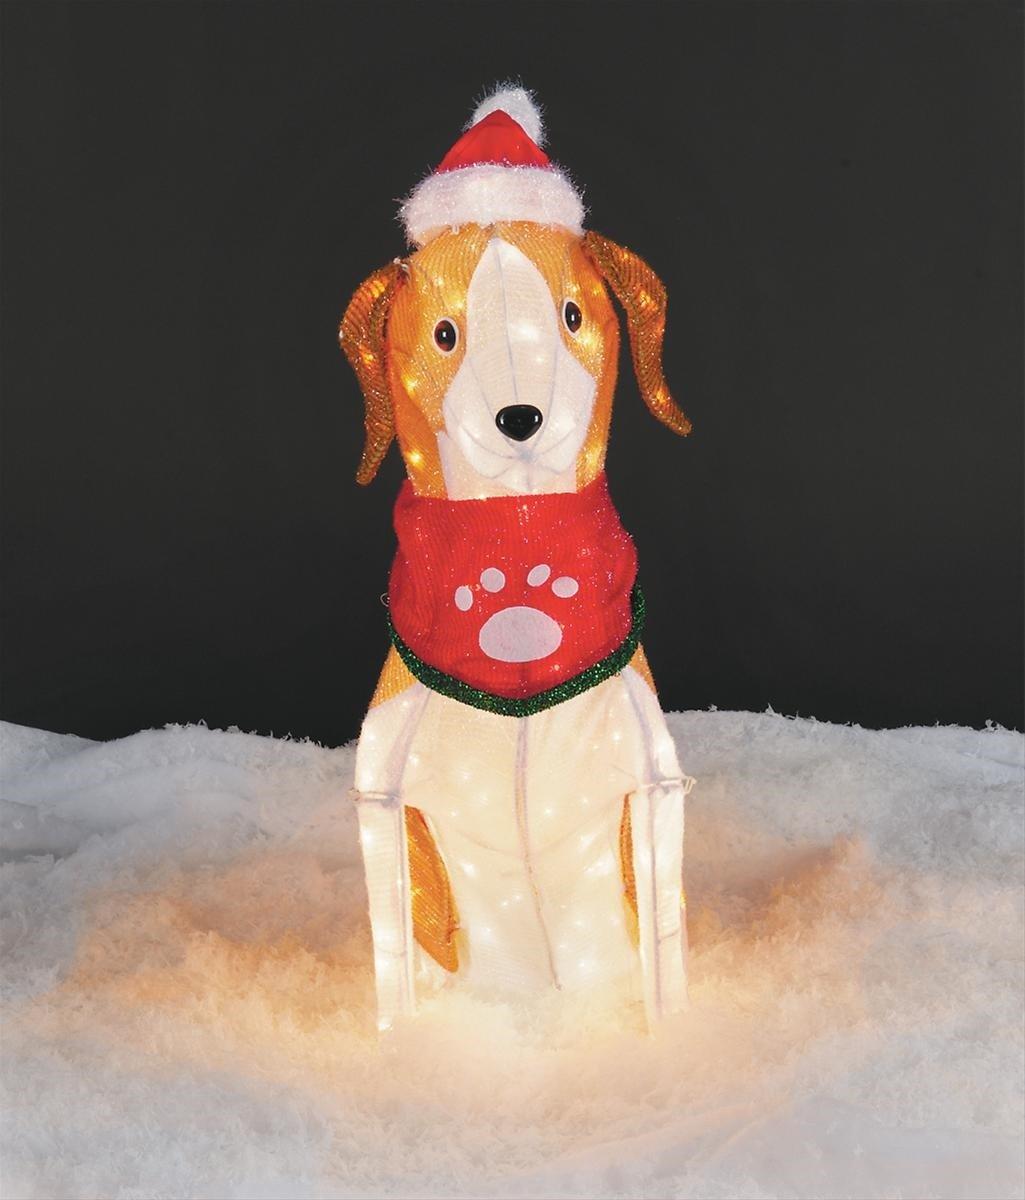 amazoncom 30 tall tinsel beagle christmas prop decoration outdoorindoor garden outdoor - Outdoor Lighted Animal Christmas Decorations